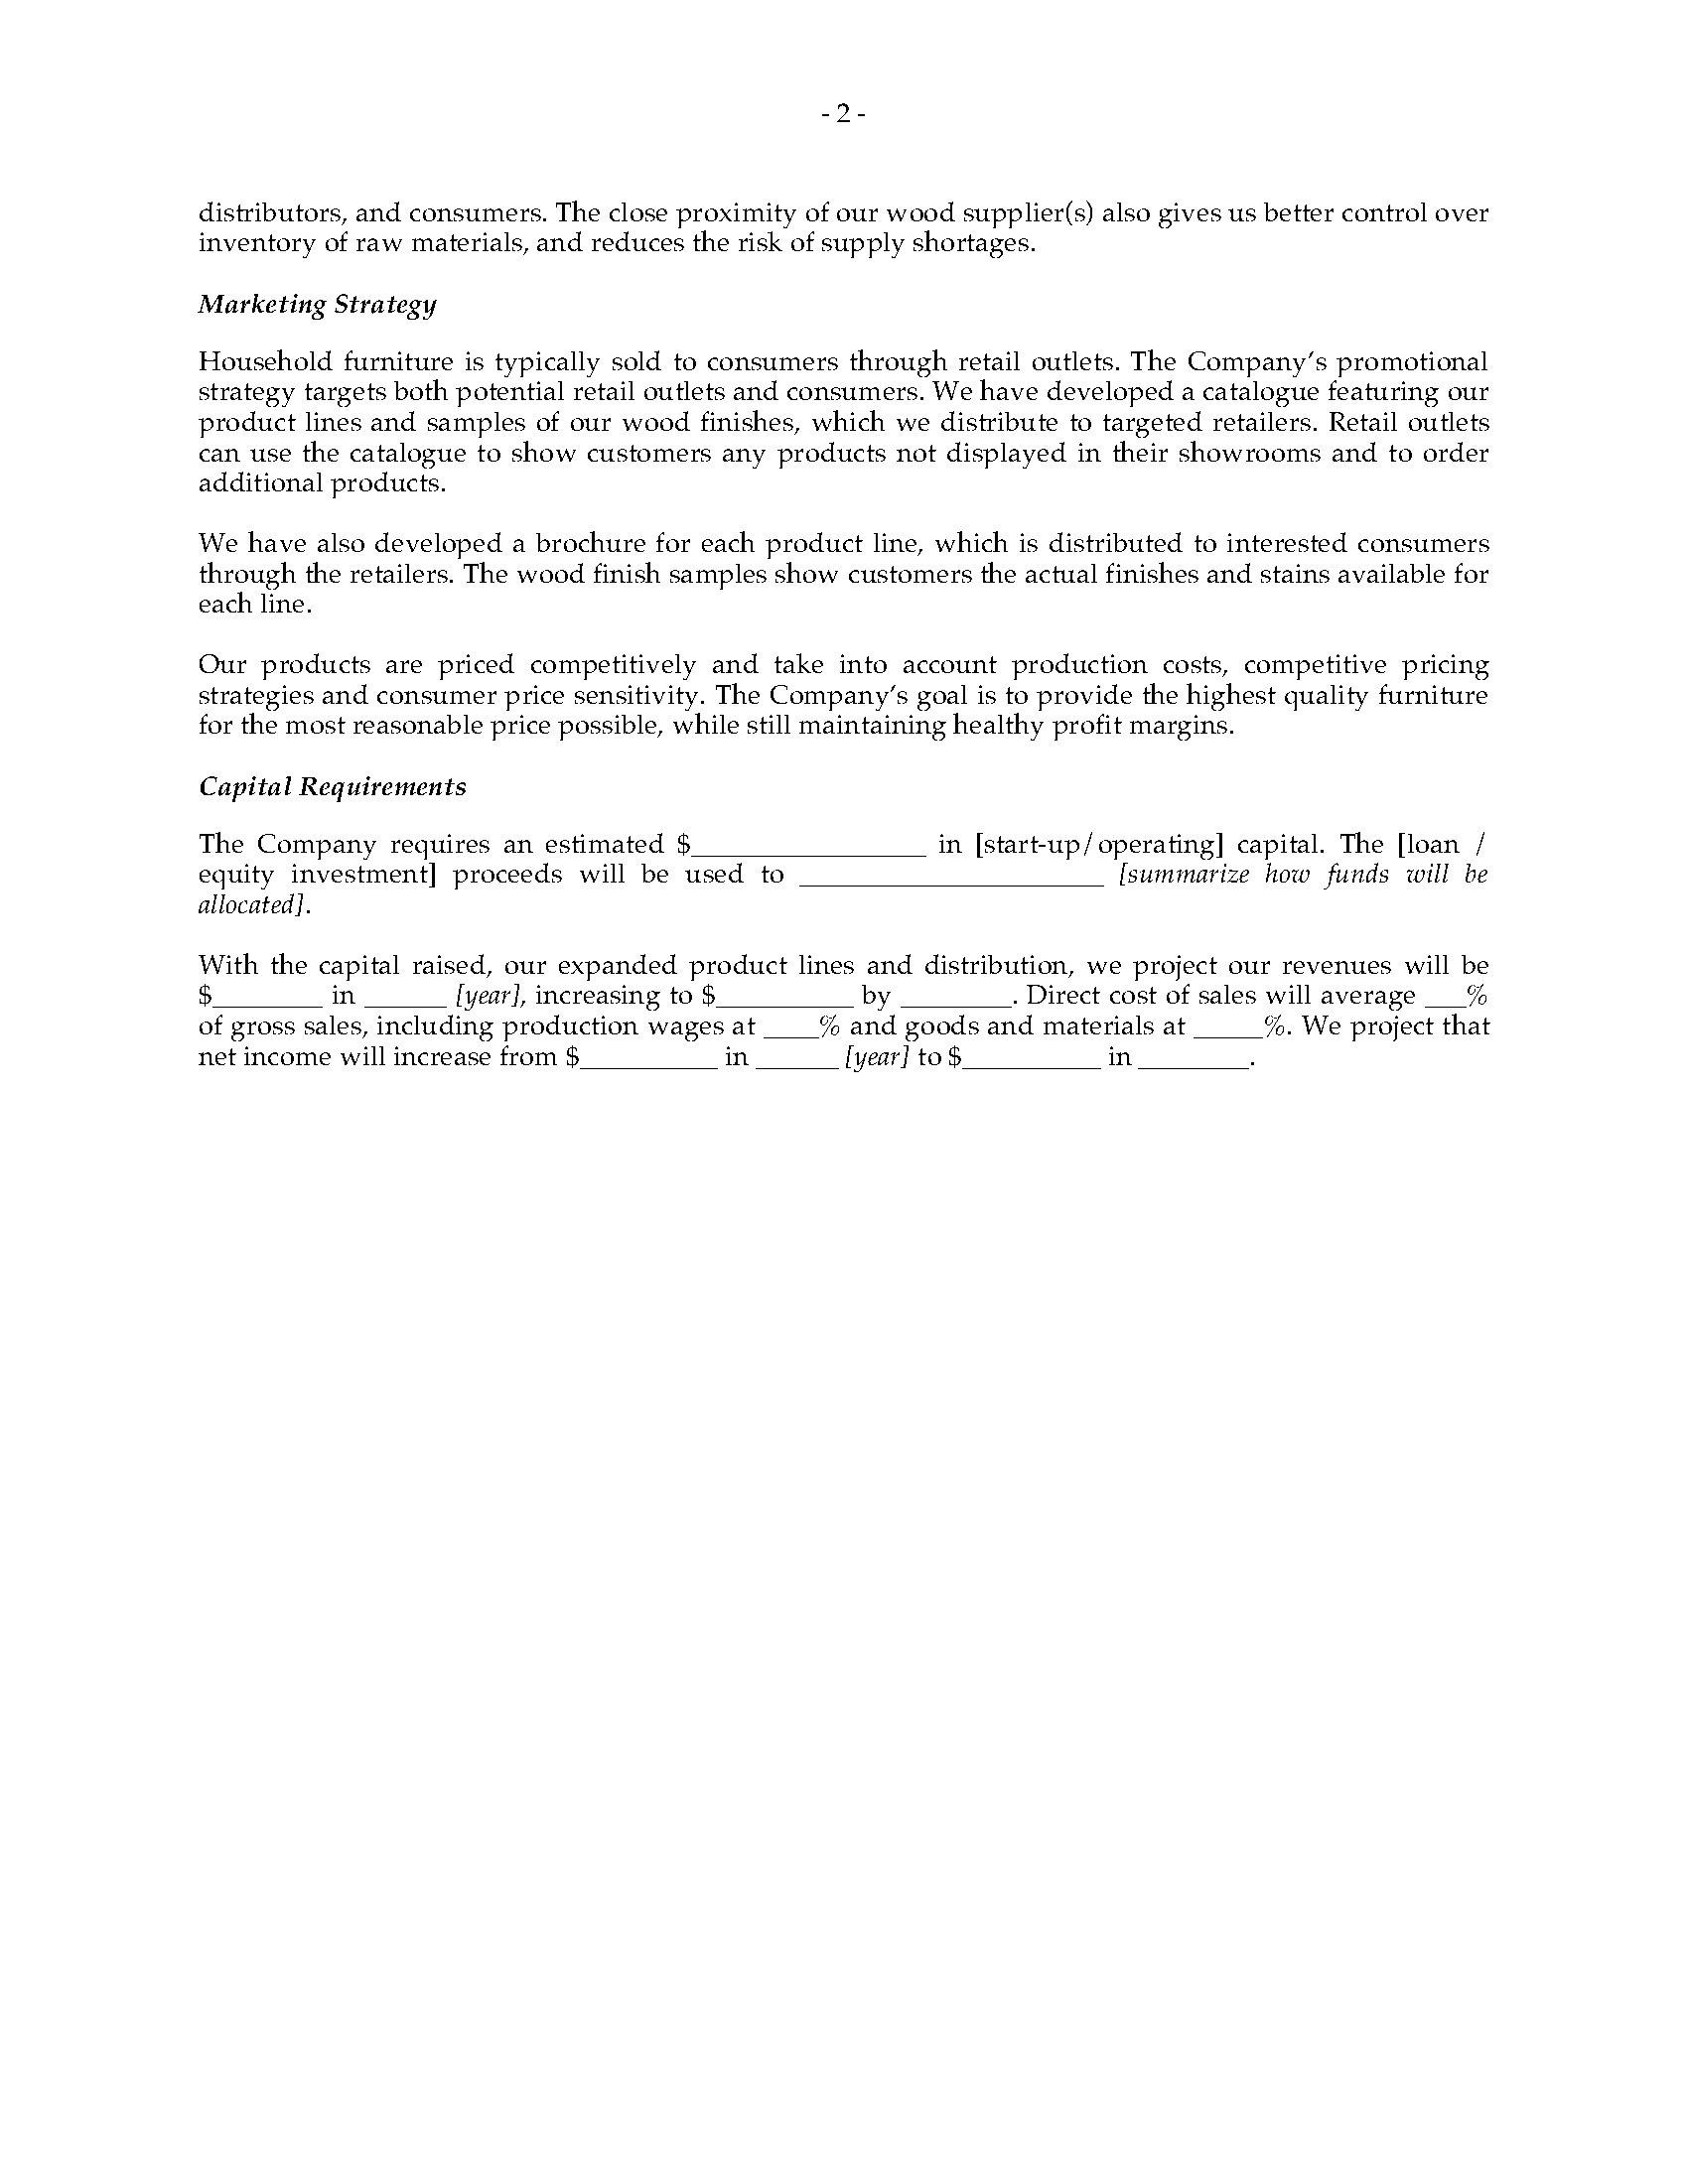 home furnishing business plan